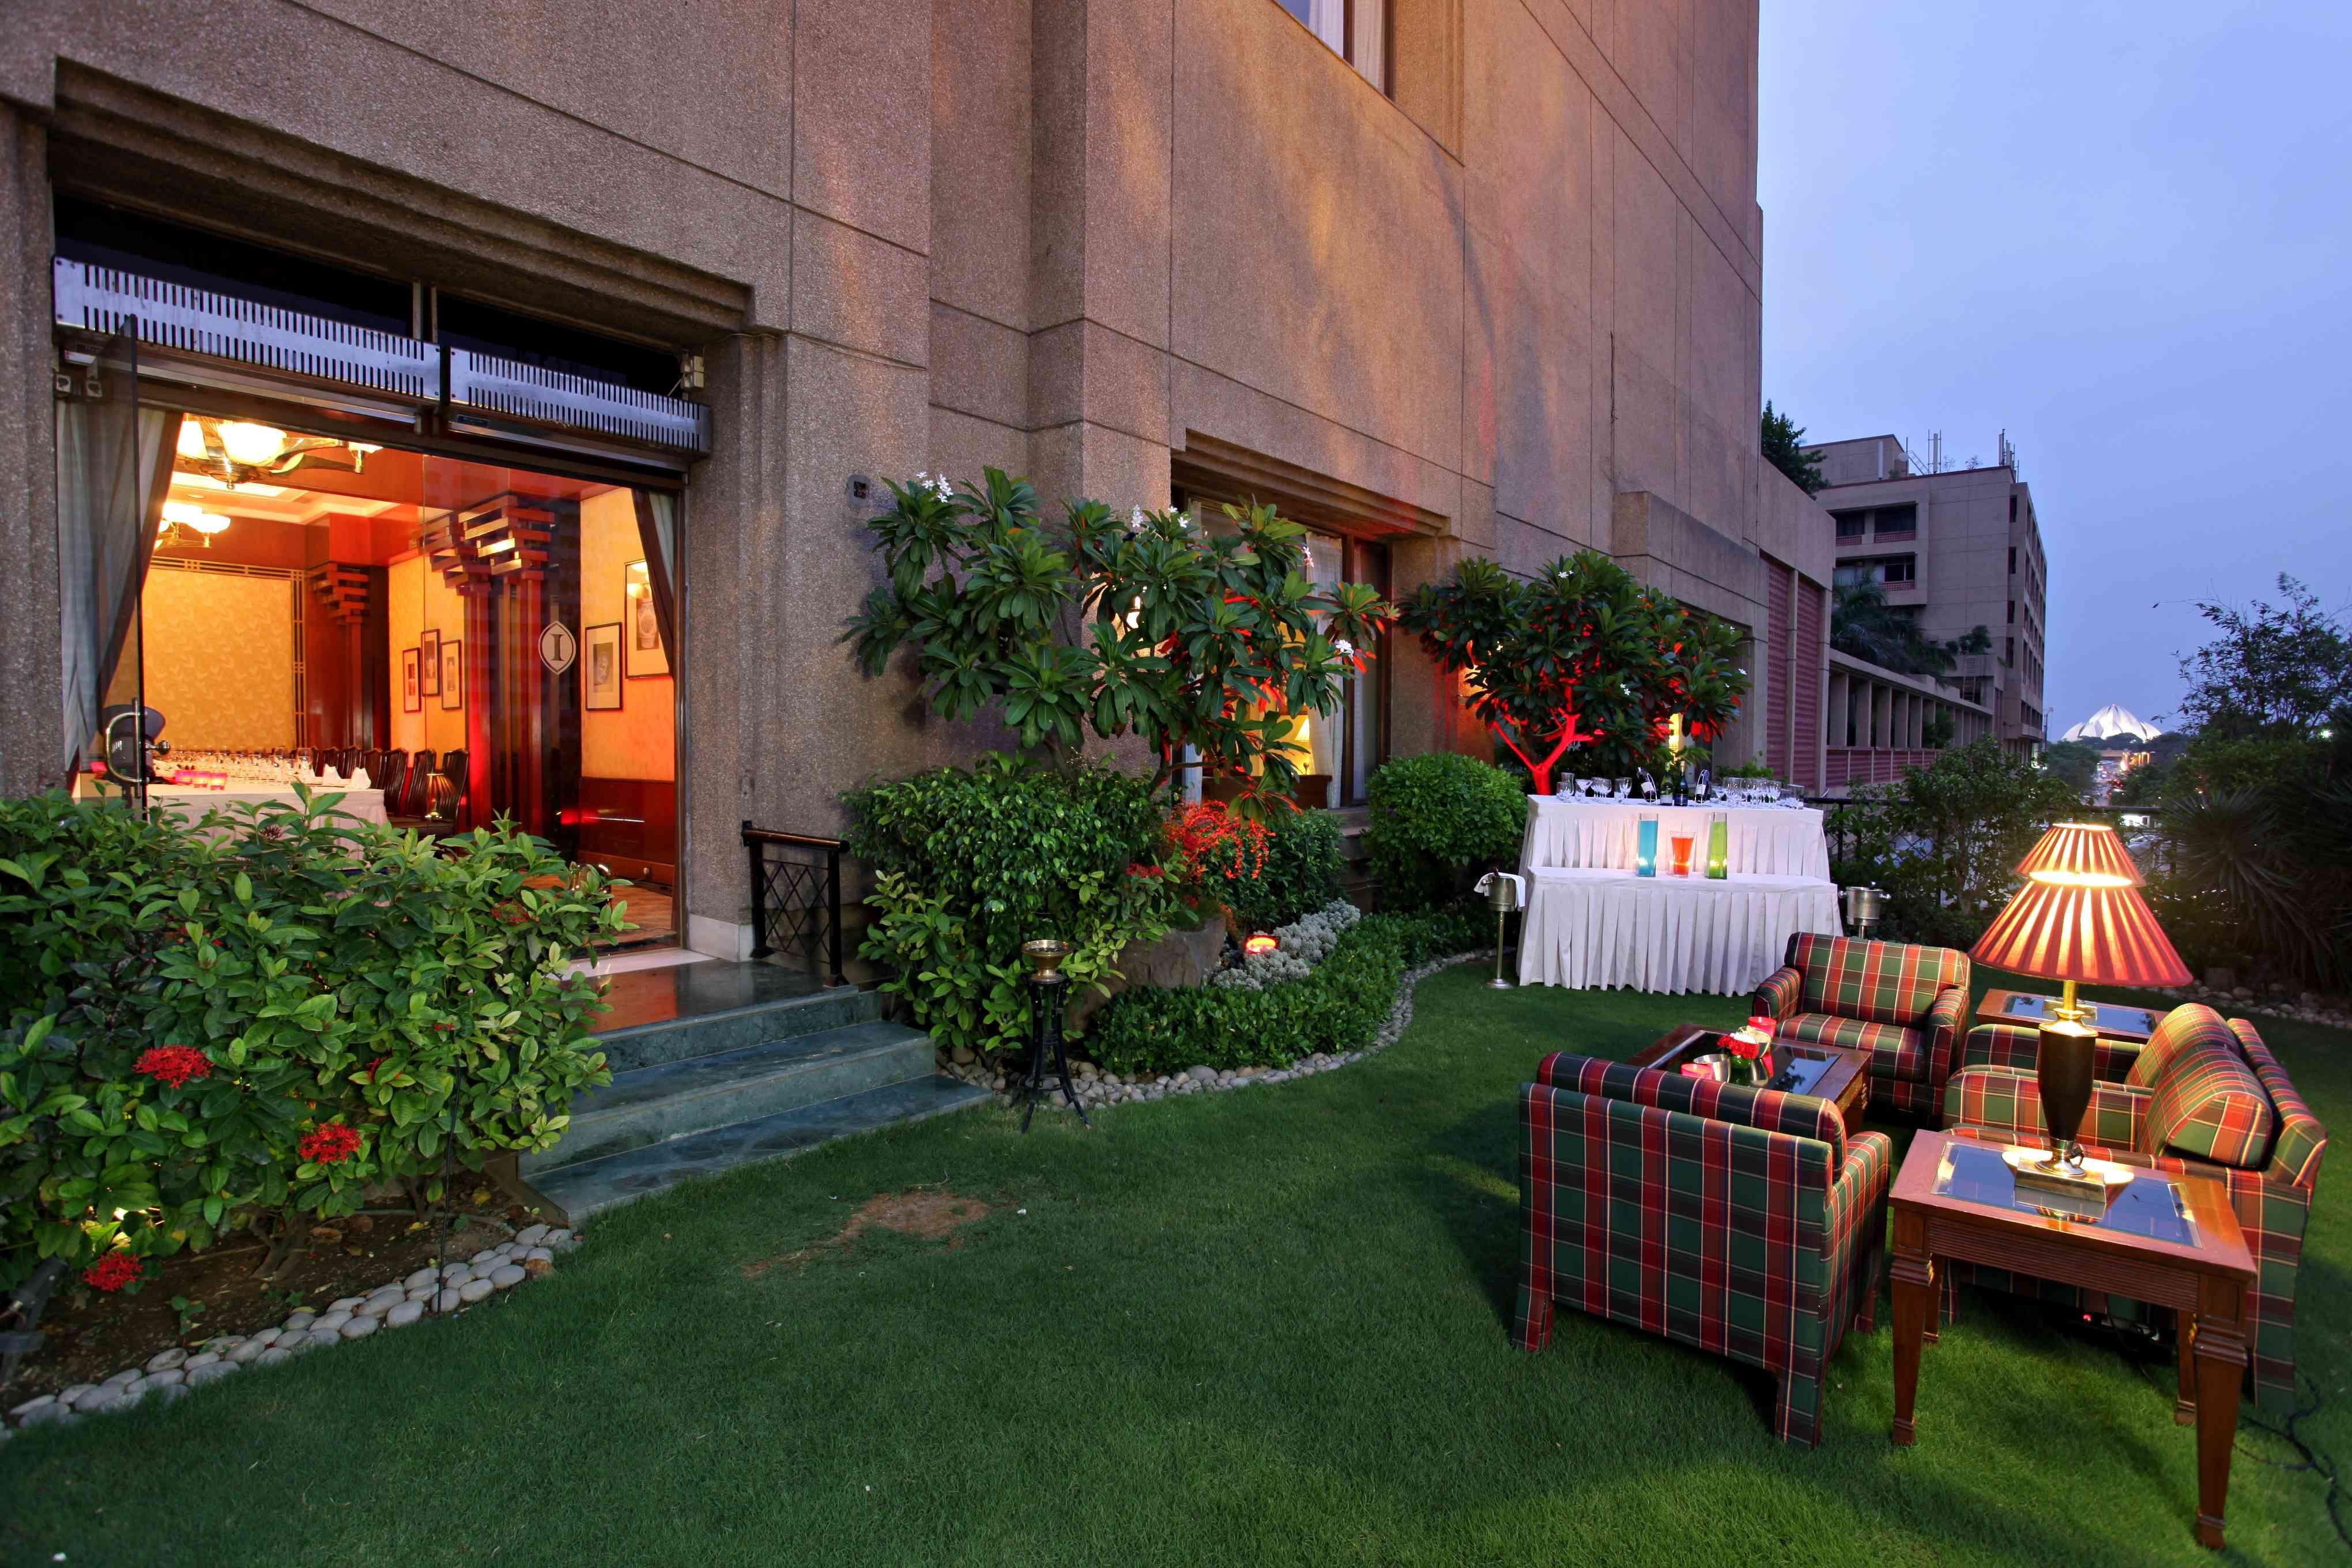 EOC PDR Lawn! Beautiful isnt it ??